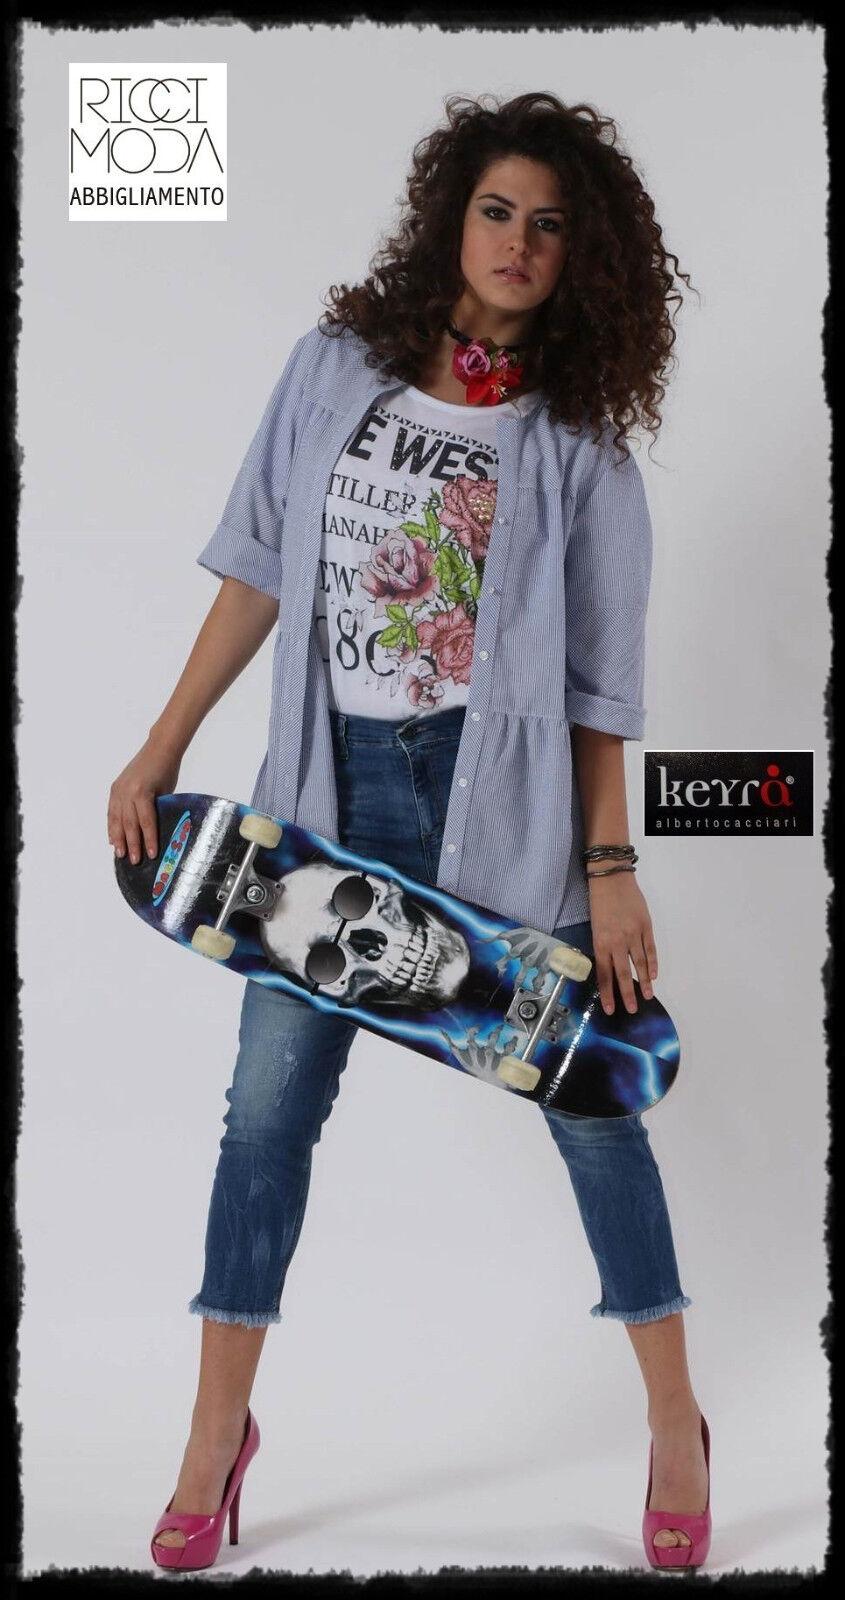 38 Keyra & 039;Femme 33 Énorme Jersey Tricotage Femme Malla Dzhers Yersey 3800330760